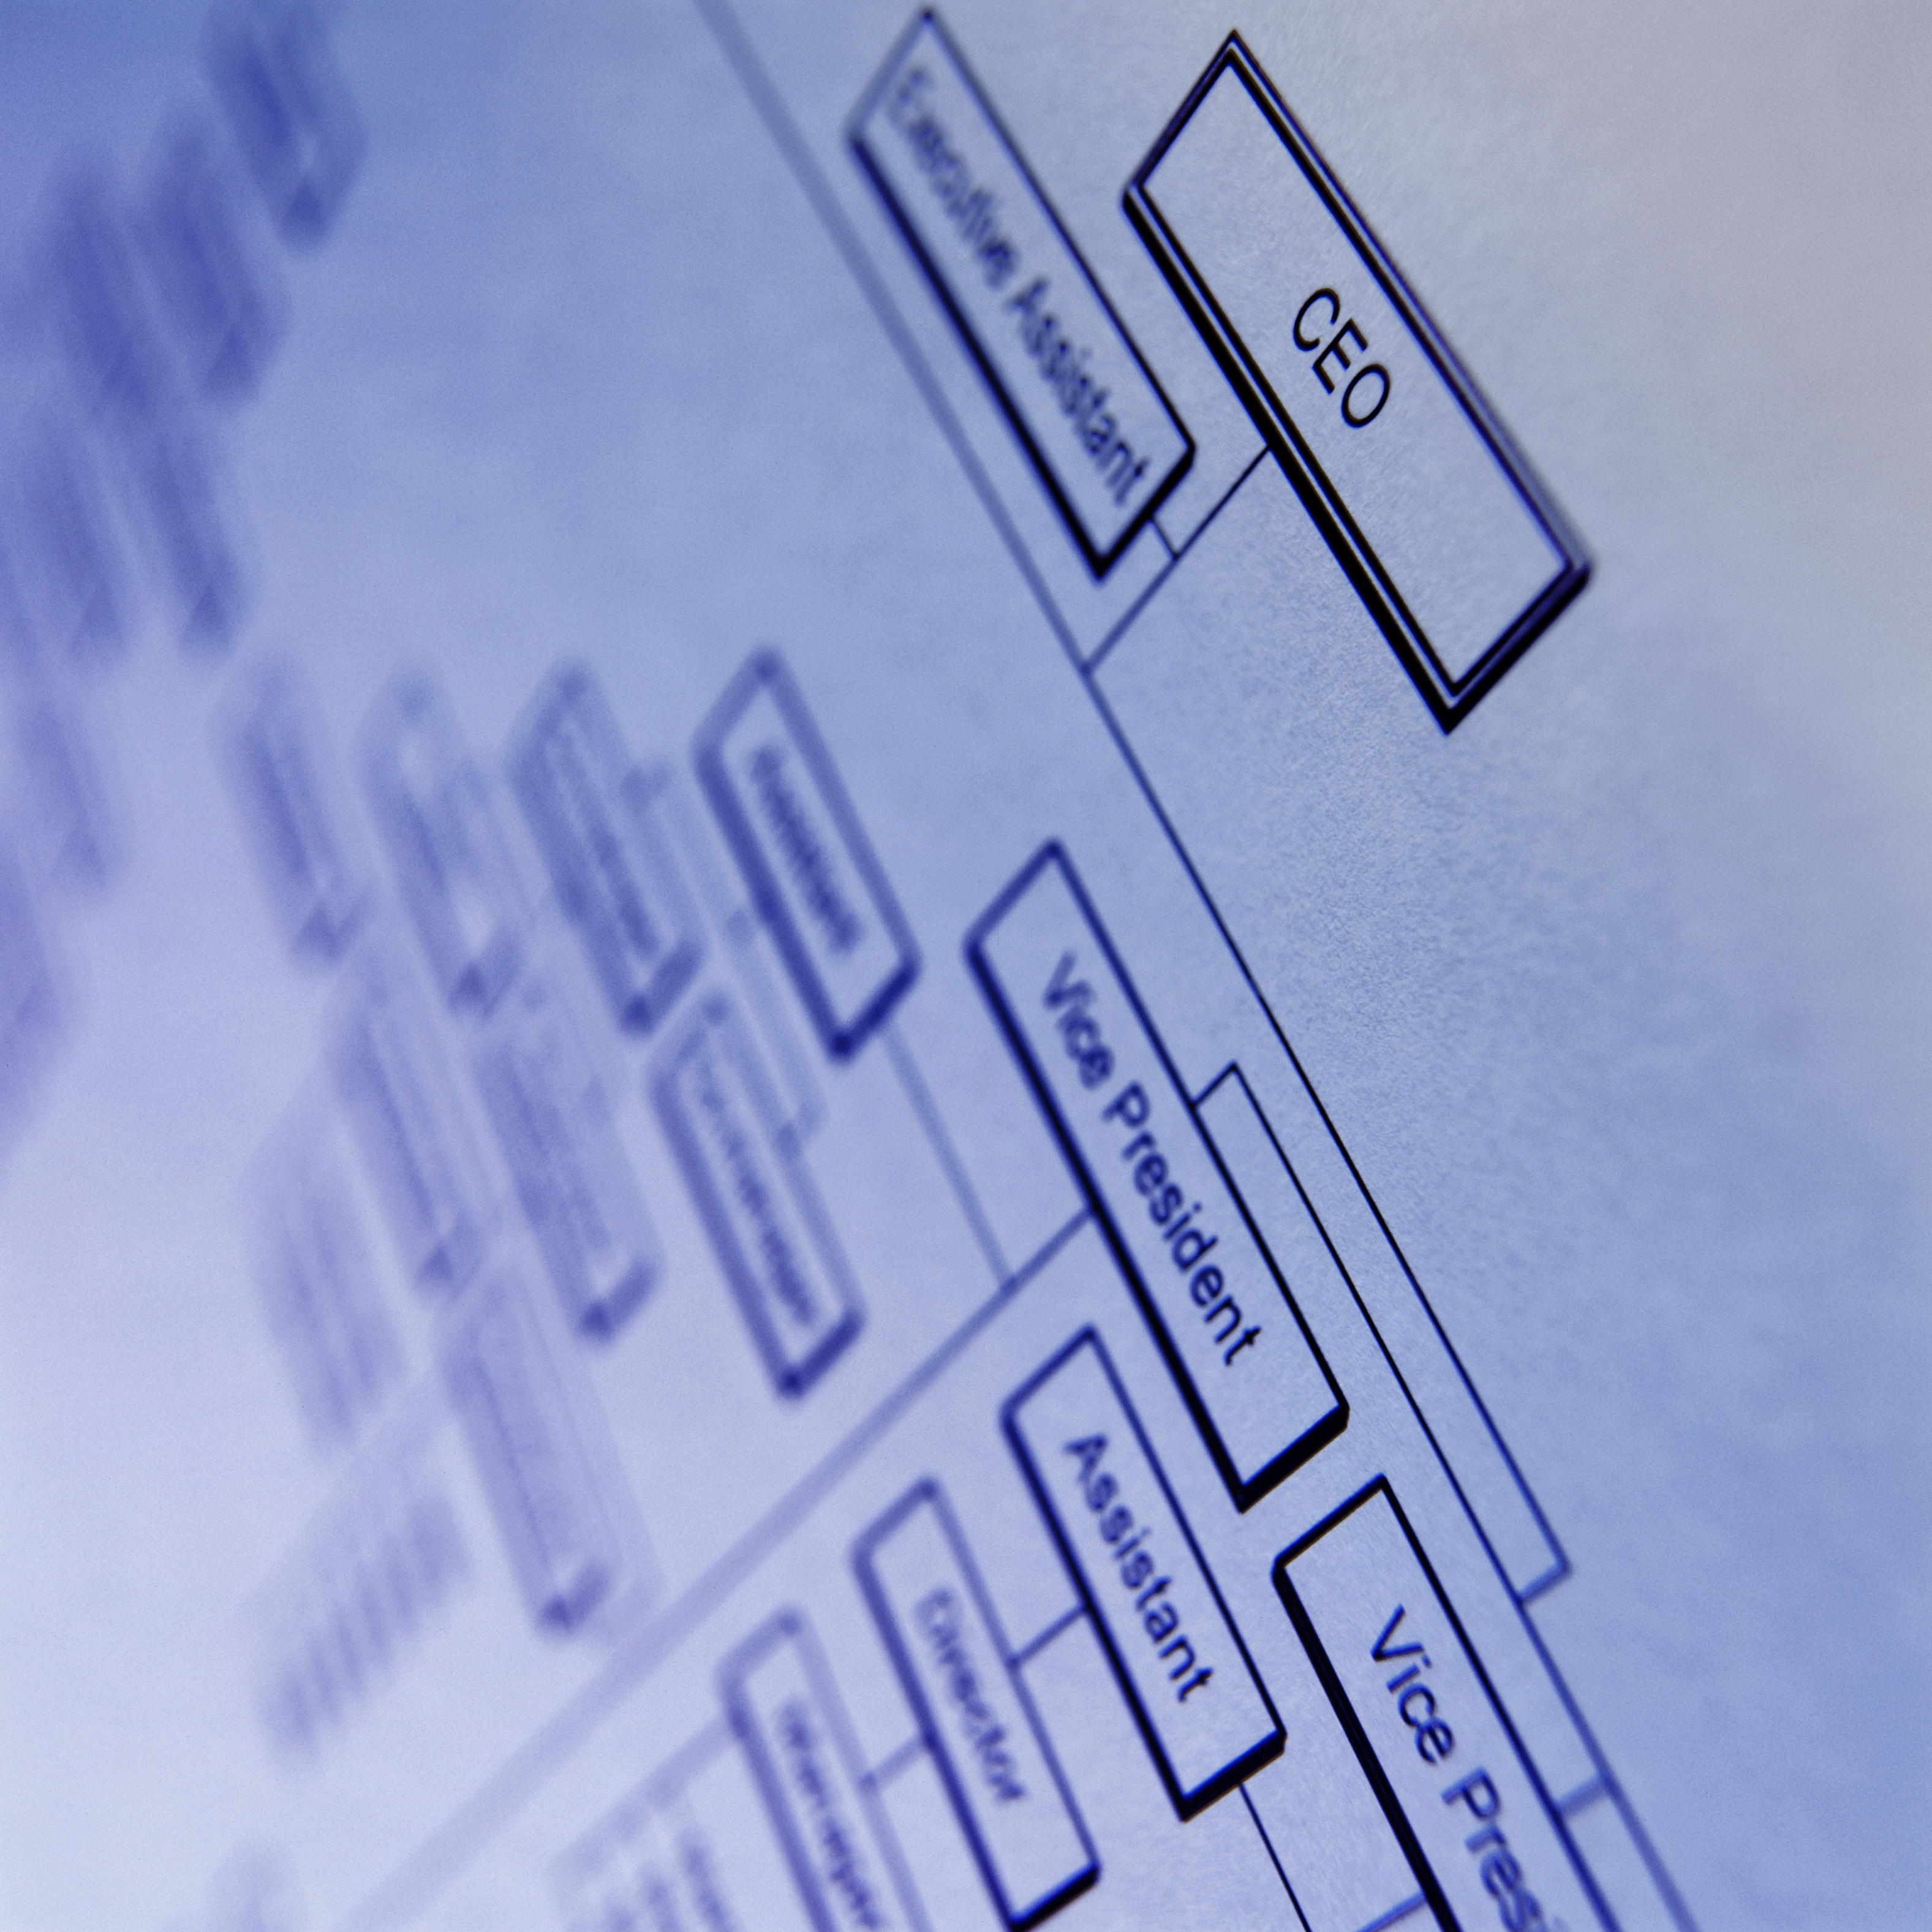 ms office organization chart template